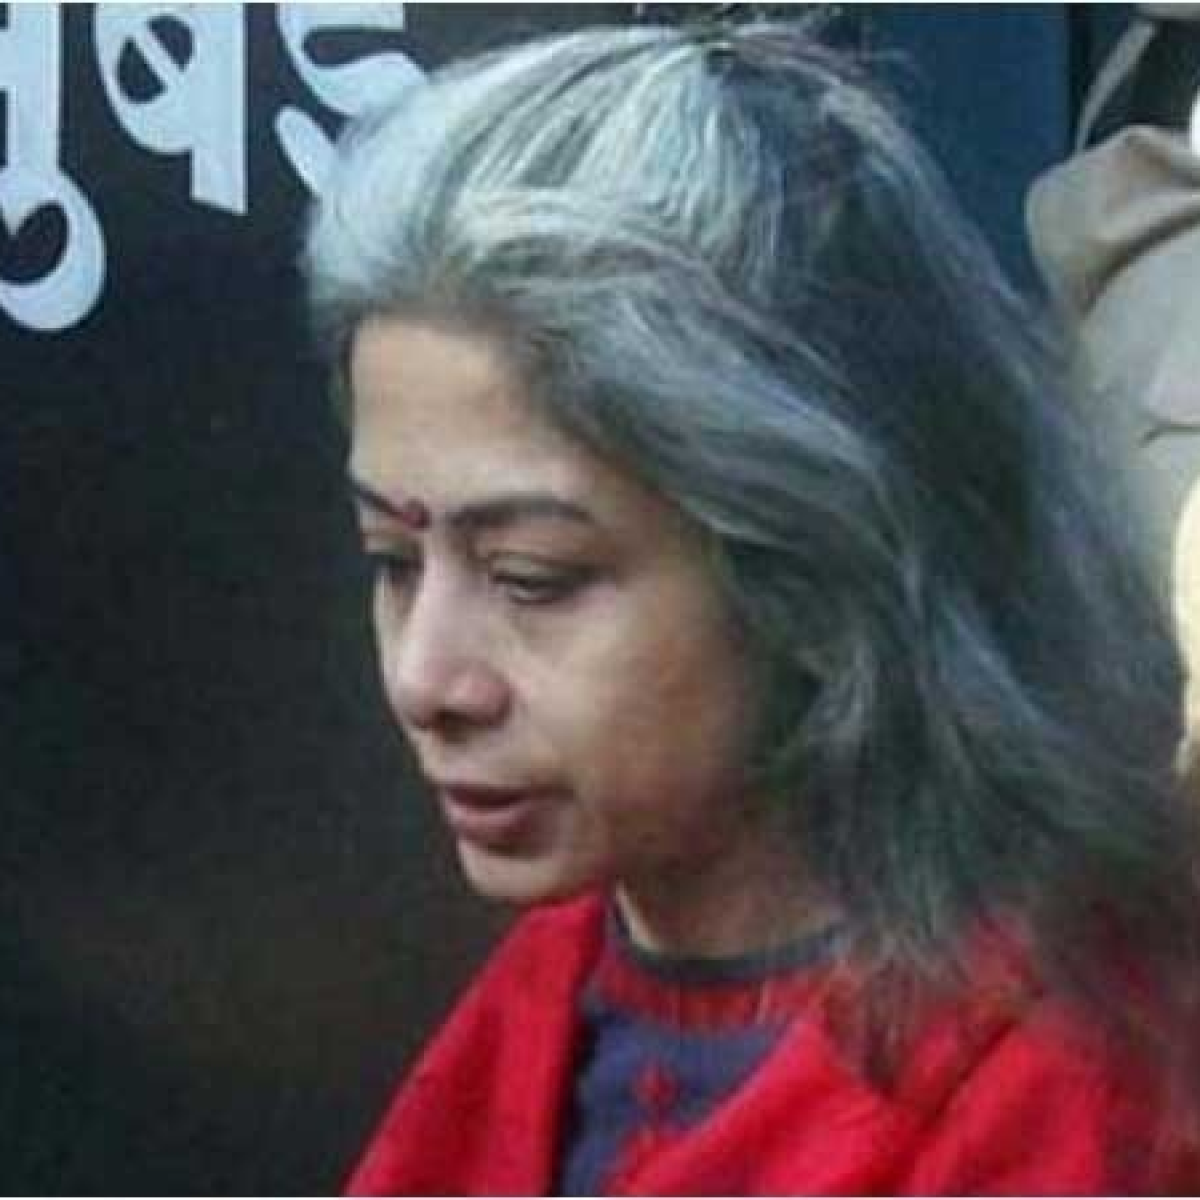 Sheena Bora murder case: Indrani Mukerjea moves CBI court for bail